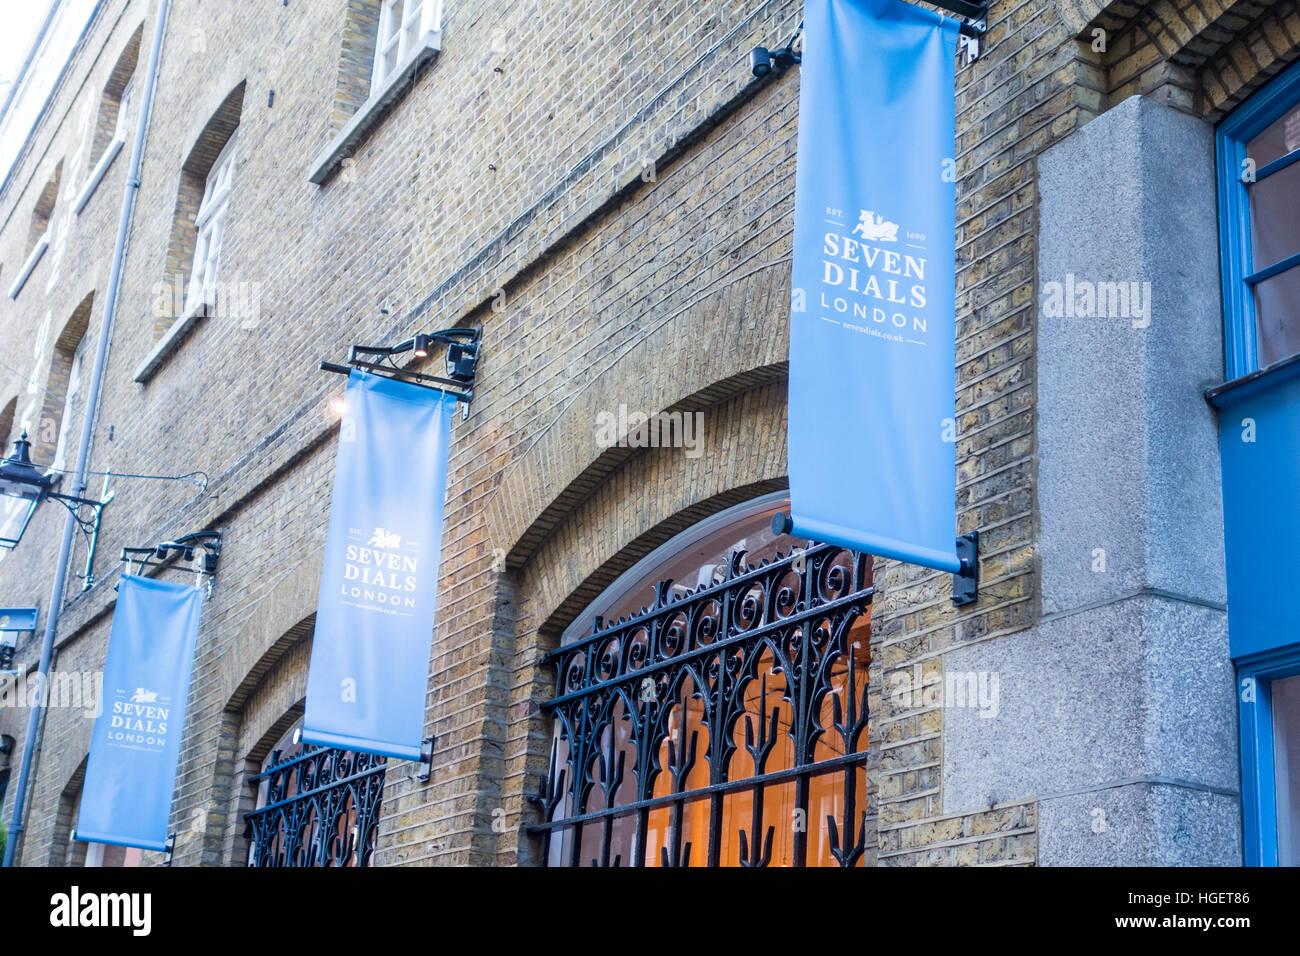 Firmar o banner en la zona de Seven Dials de Londres cerca de Covent Garden. UK Imagen De Stock